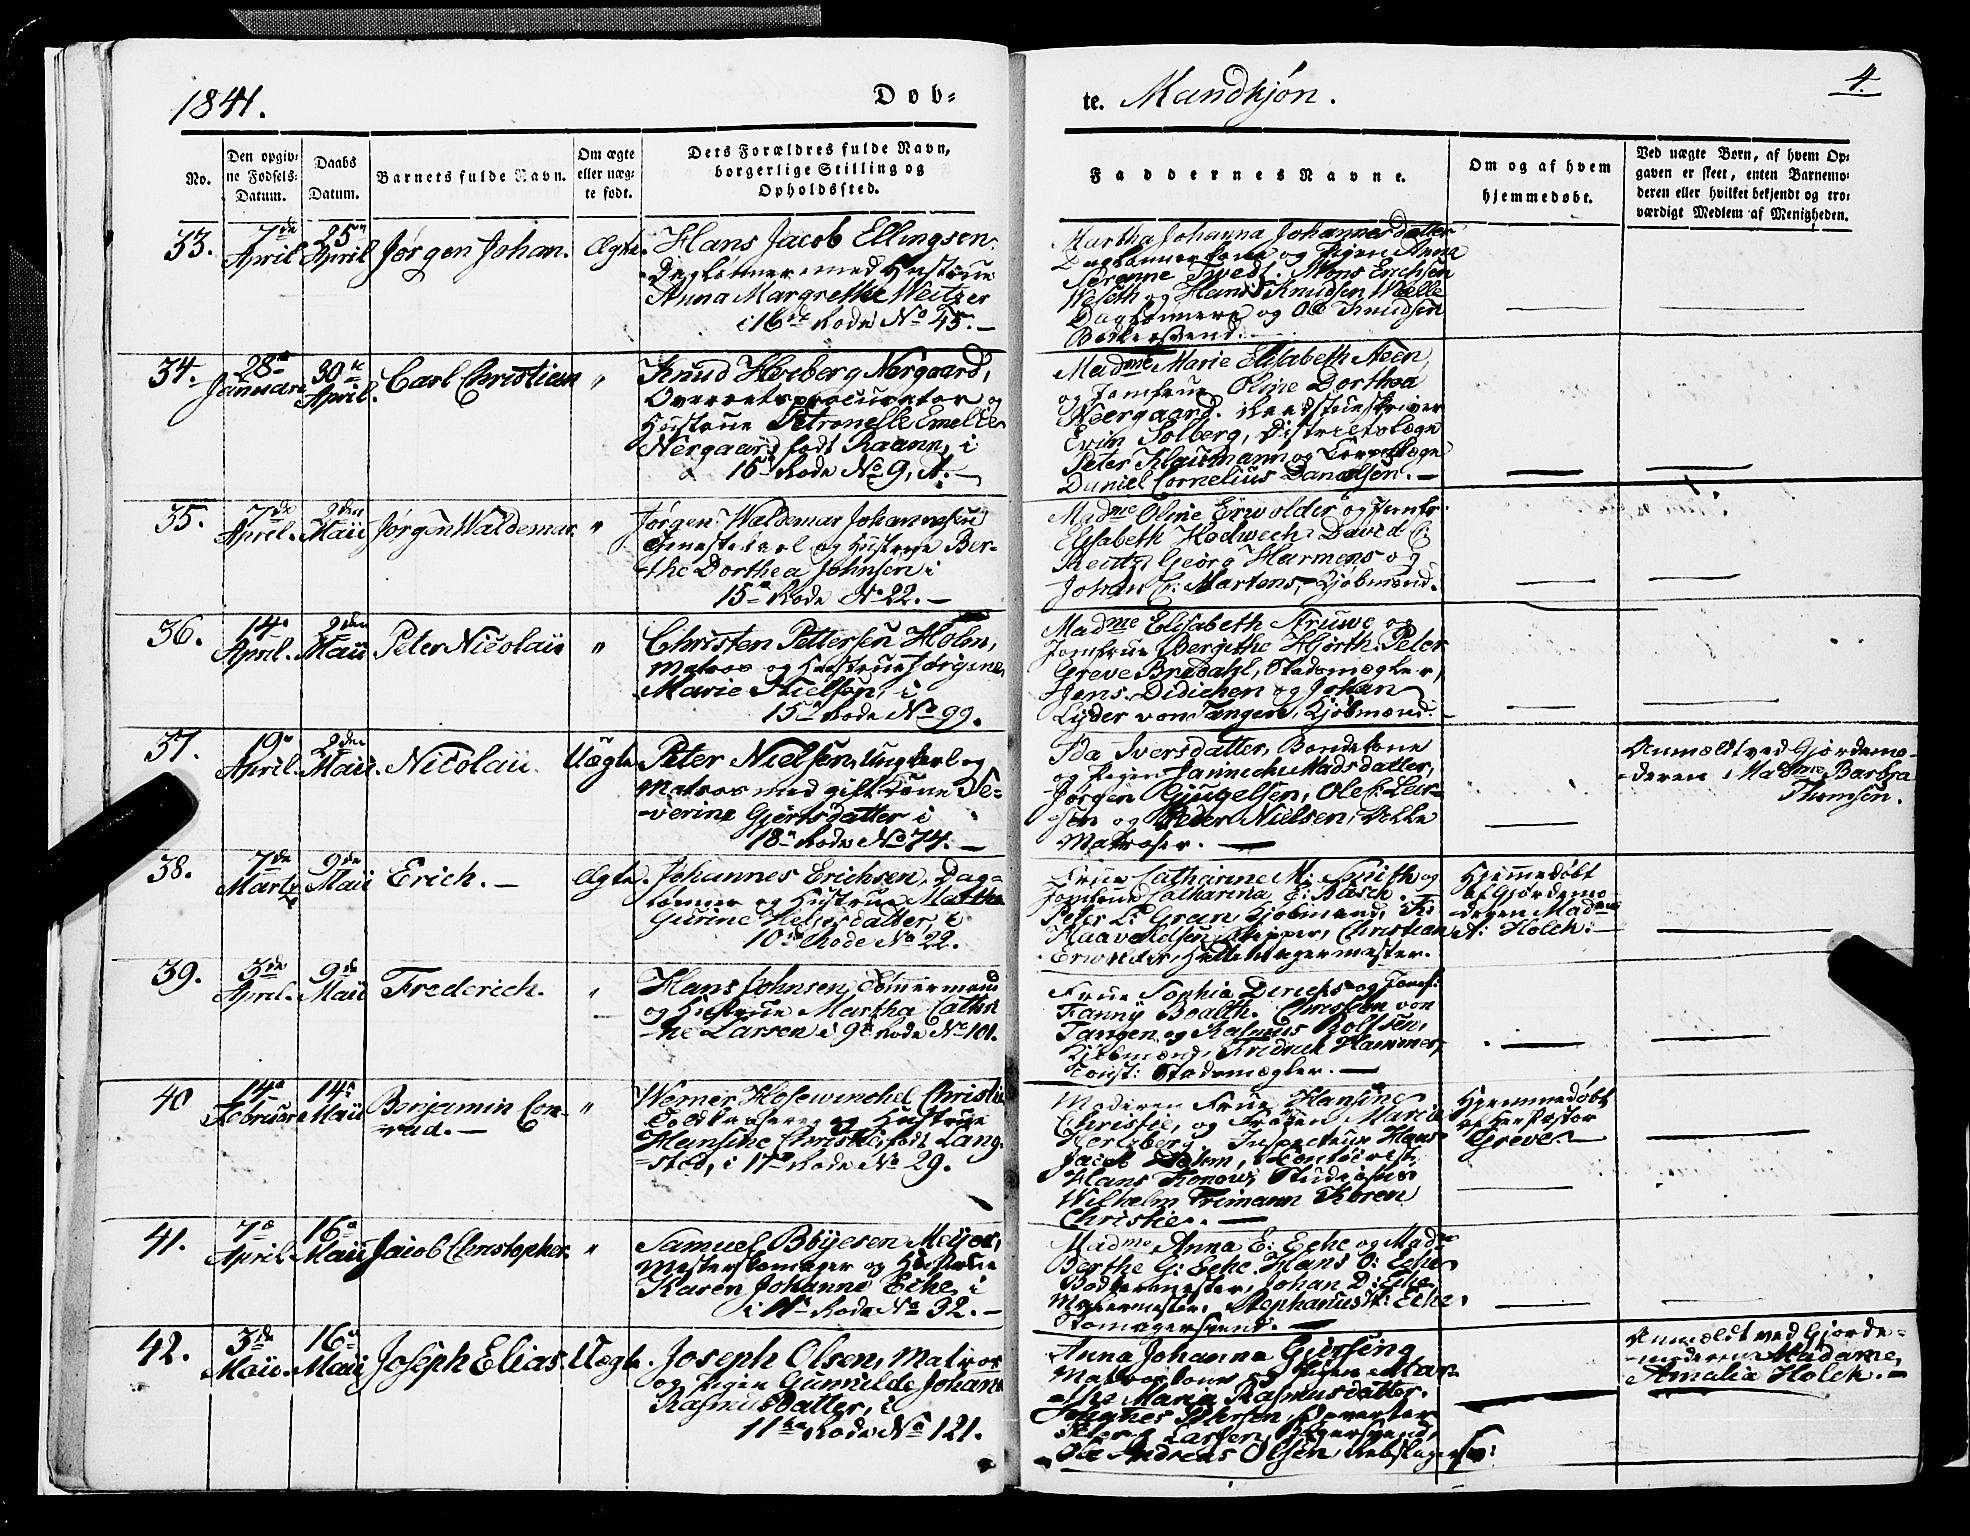 SAB, Domkirken sokneprestembete, H/Haa/L0019: Ministerialbok nr. B 2, 1841-1851, s. 4